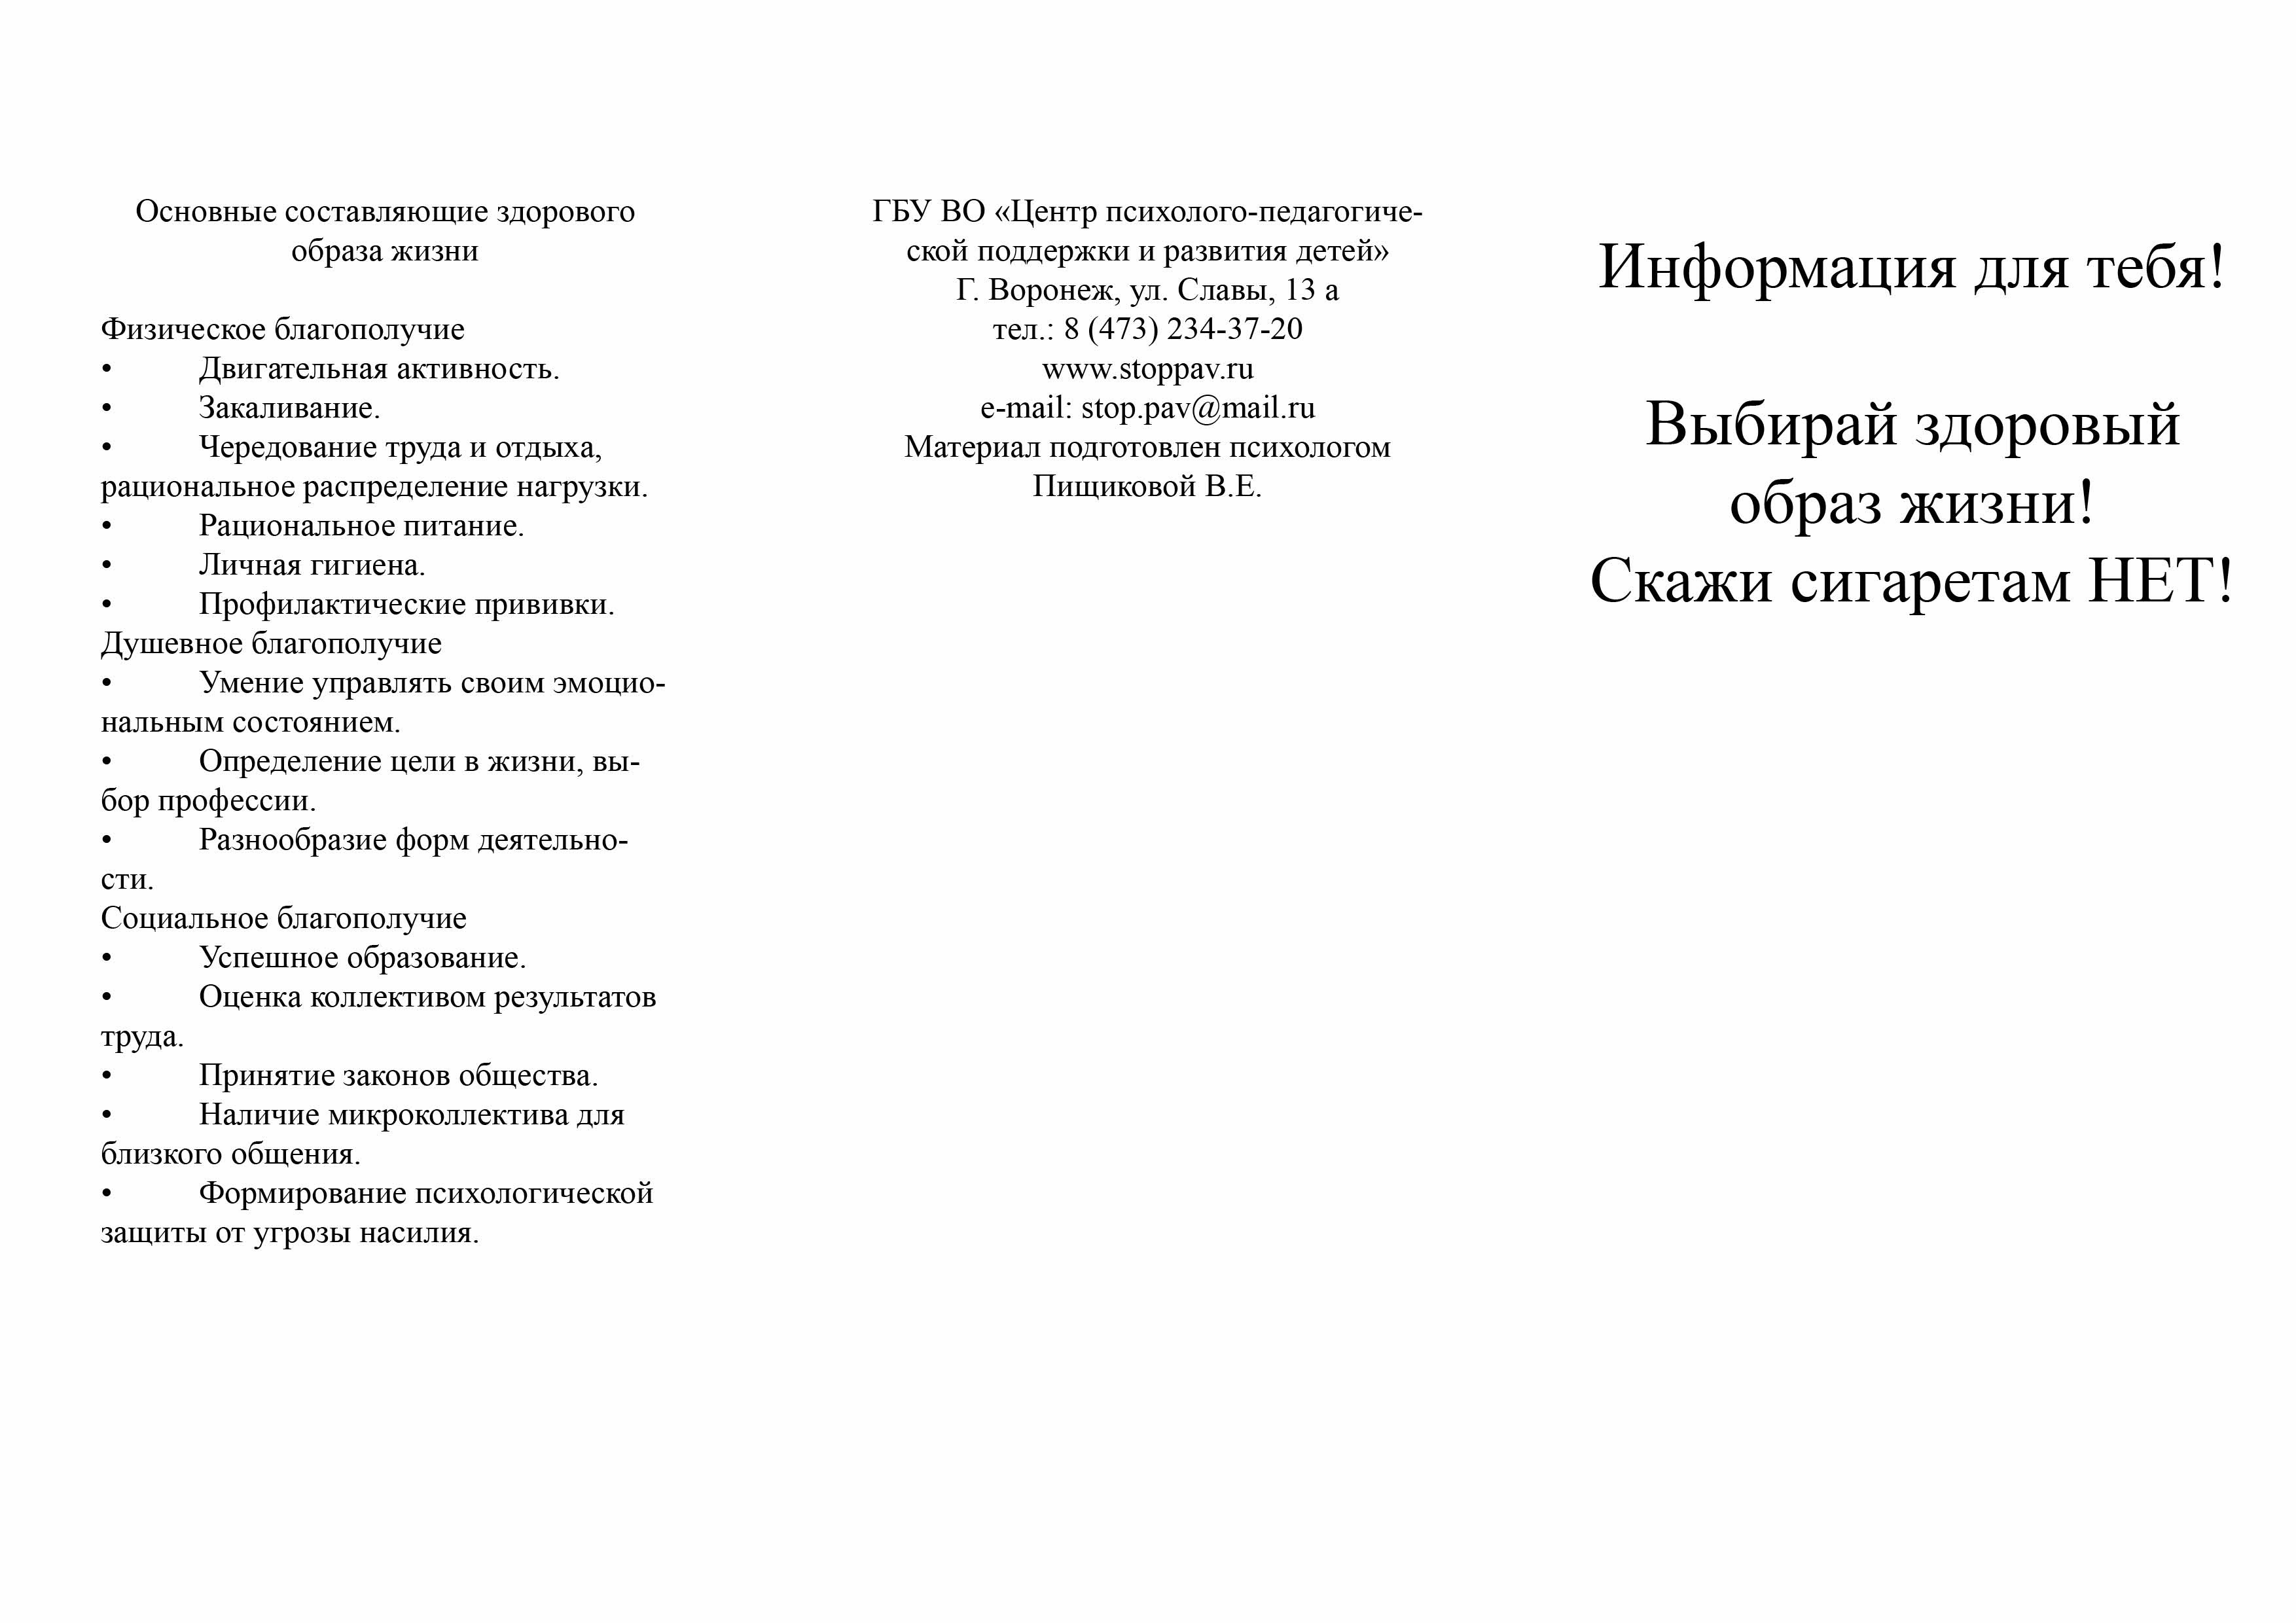 C:\Documents and Settings\user2pc\Рабочий стол\С чата\Ходакова Юлия Сергеевна\буклет.jpg